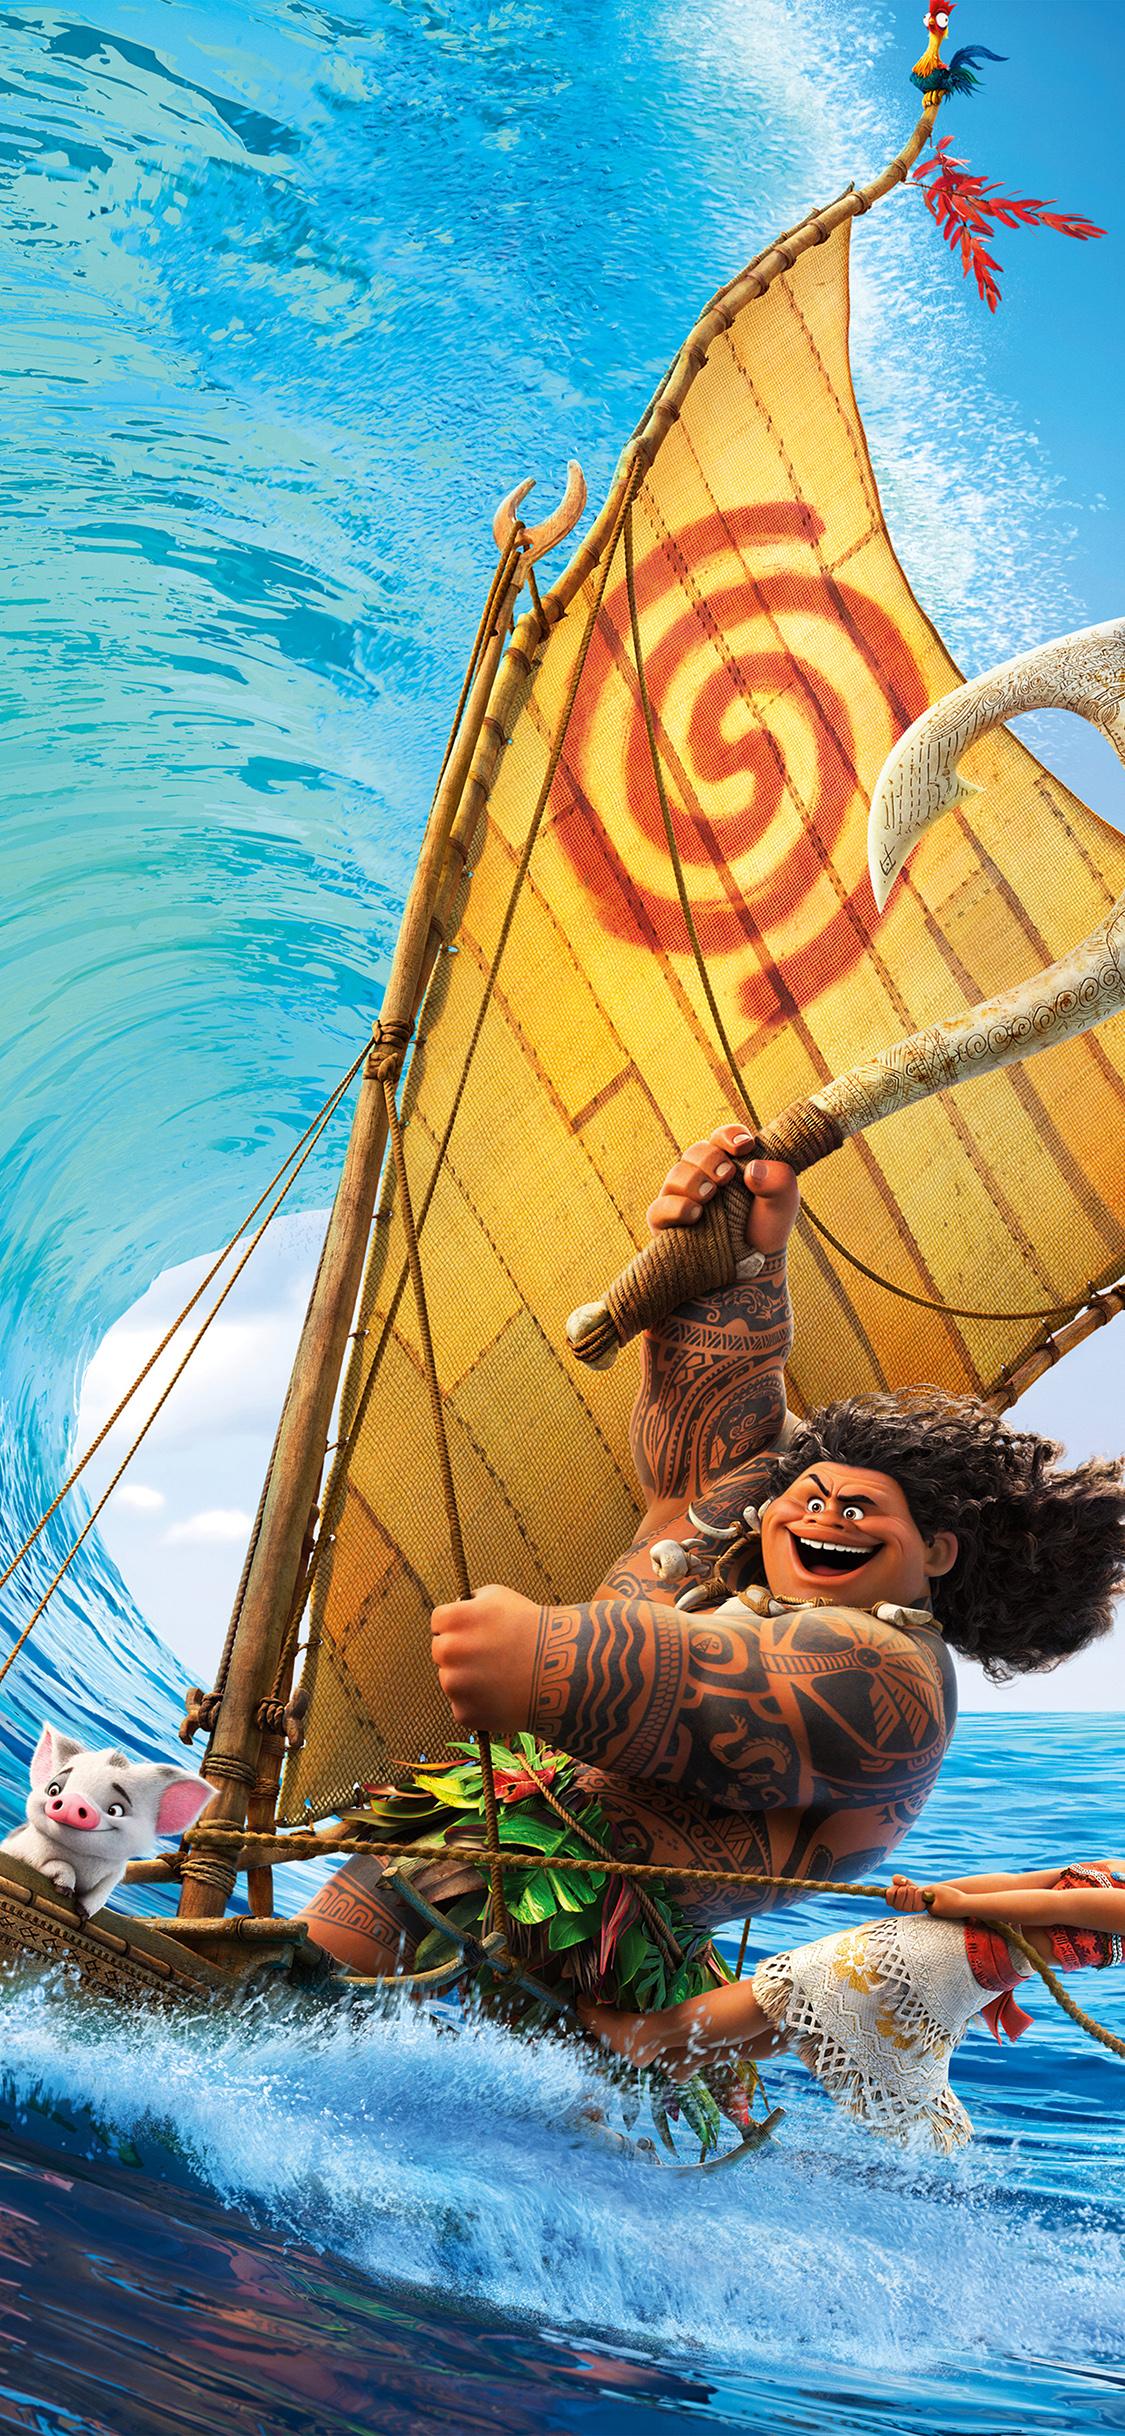 iPhoneXpapers.com-Apple-iPhone-wallpaper-aw11-surf-moana-disney-film-anime-illustration-art